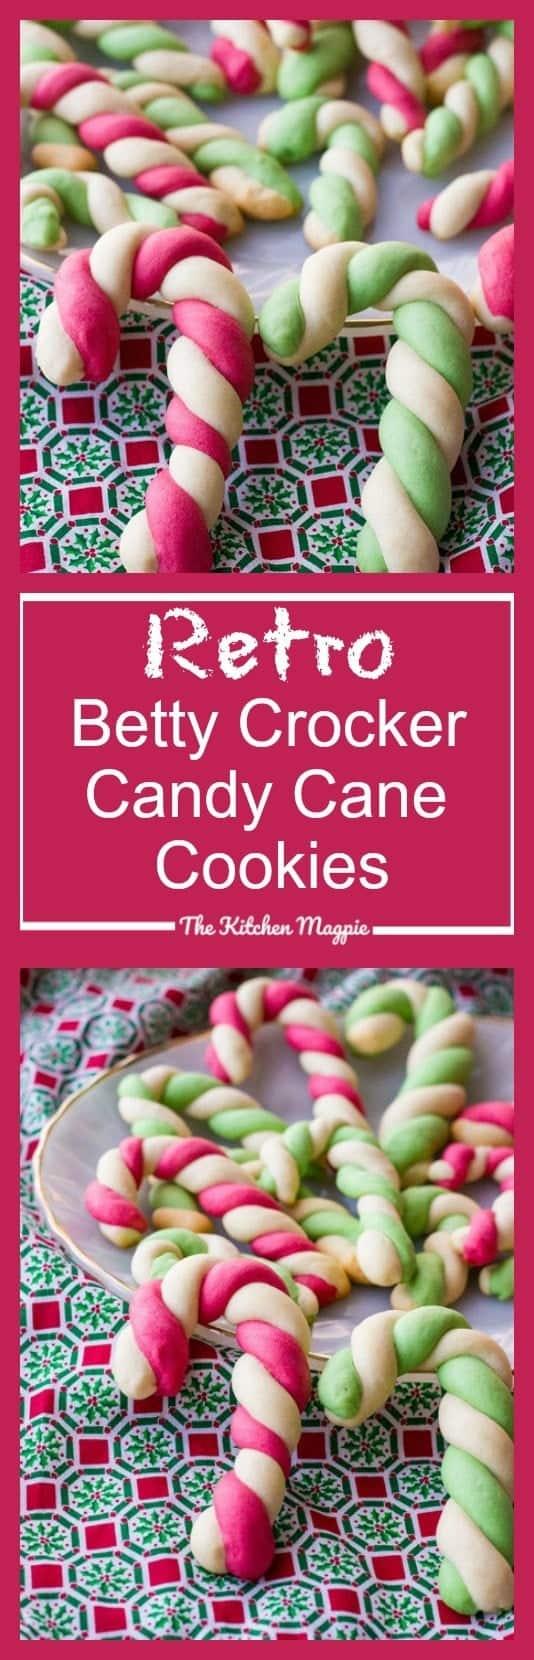 53 Retro Betty Crocker Candy Cane Cookies